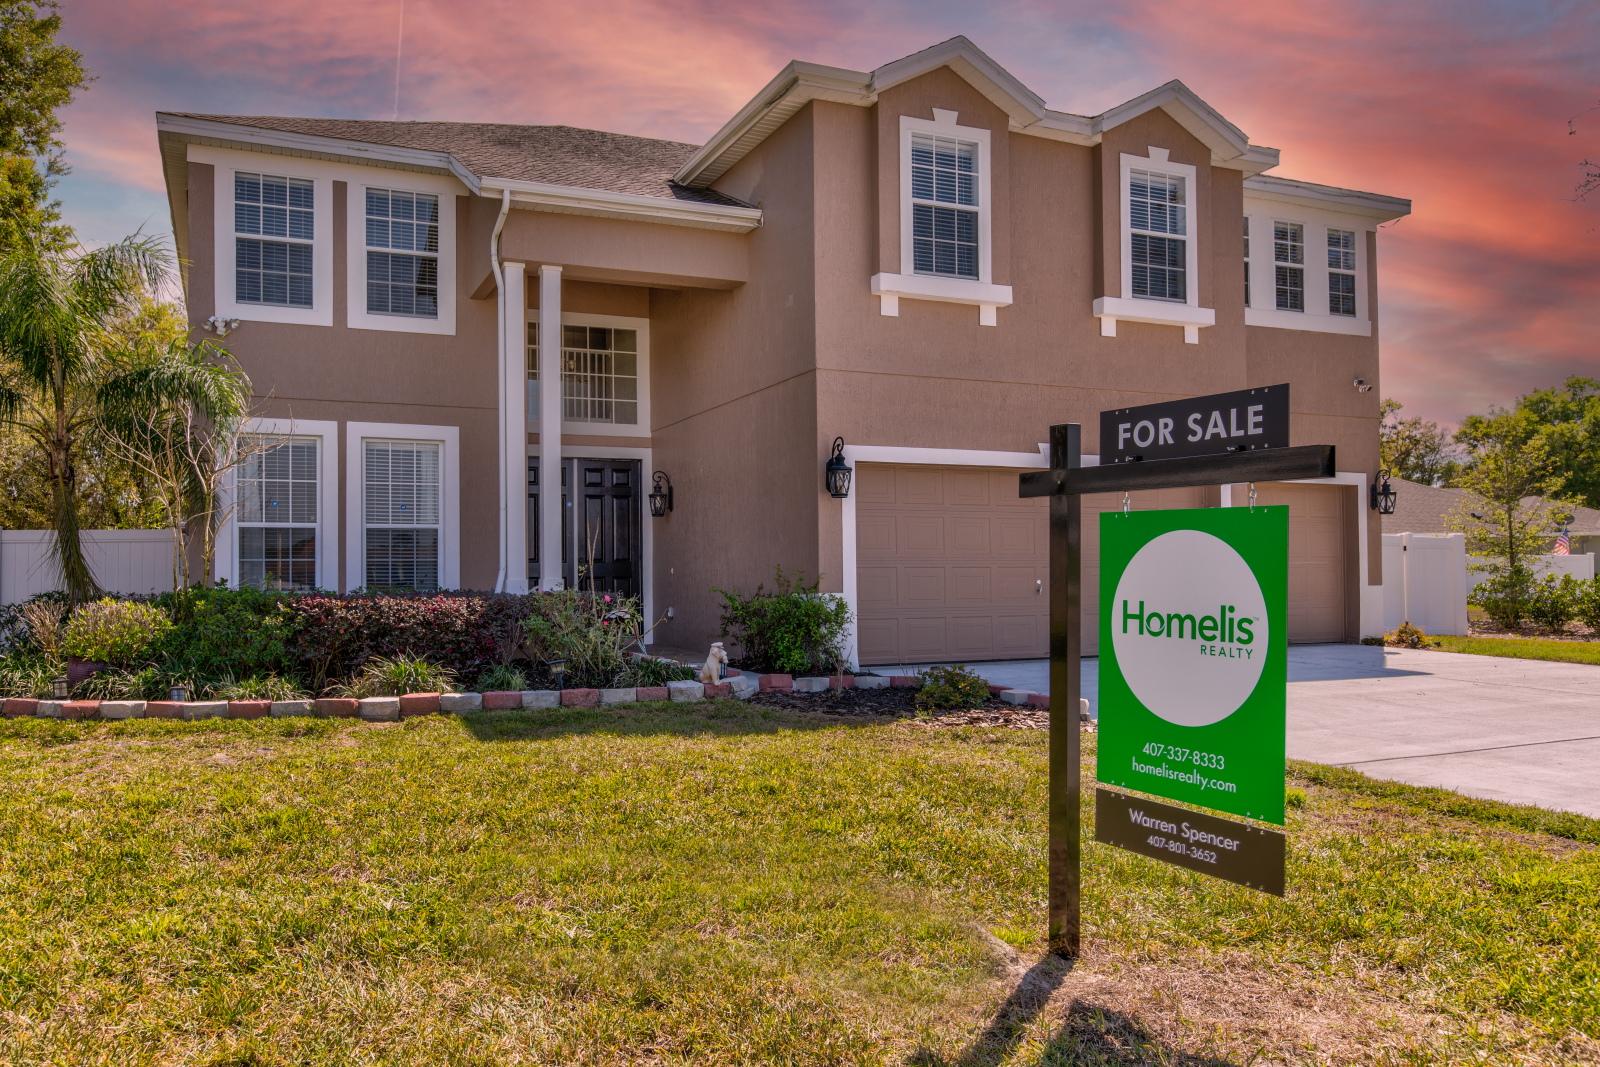 deland house for sale